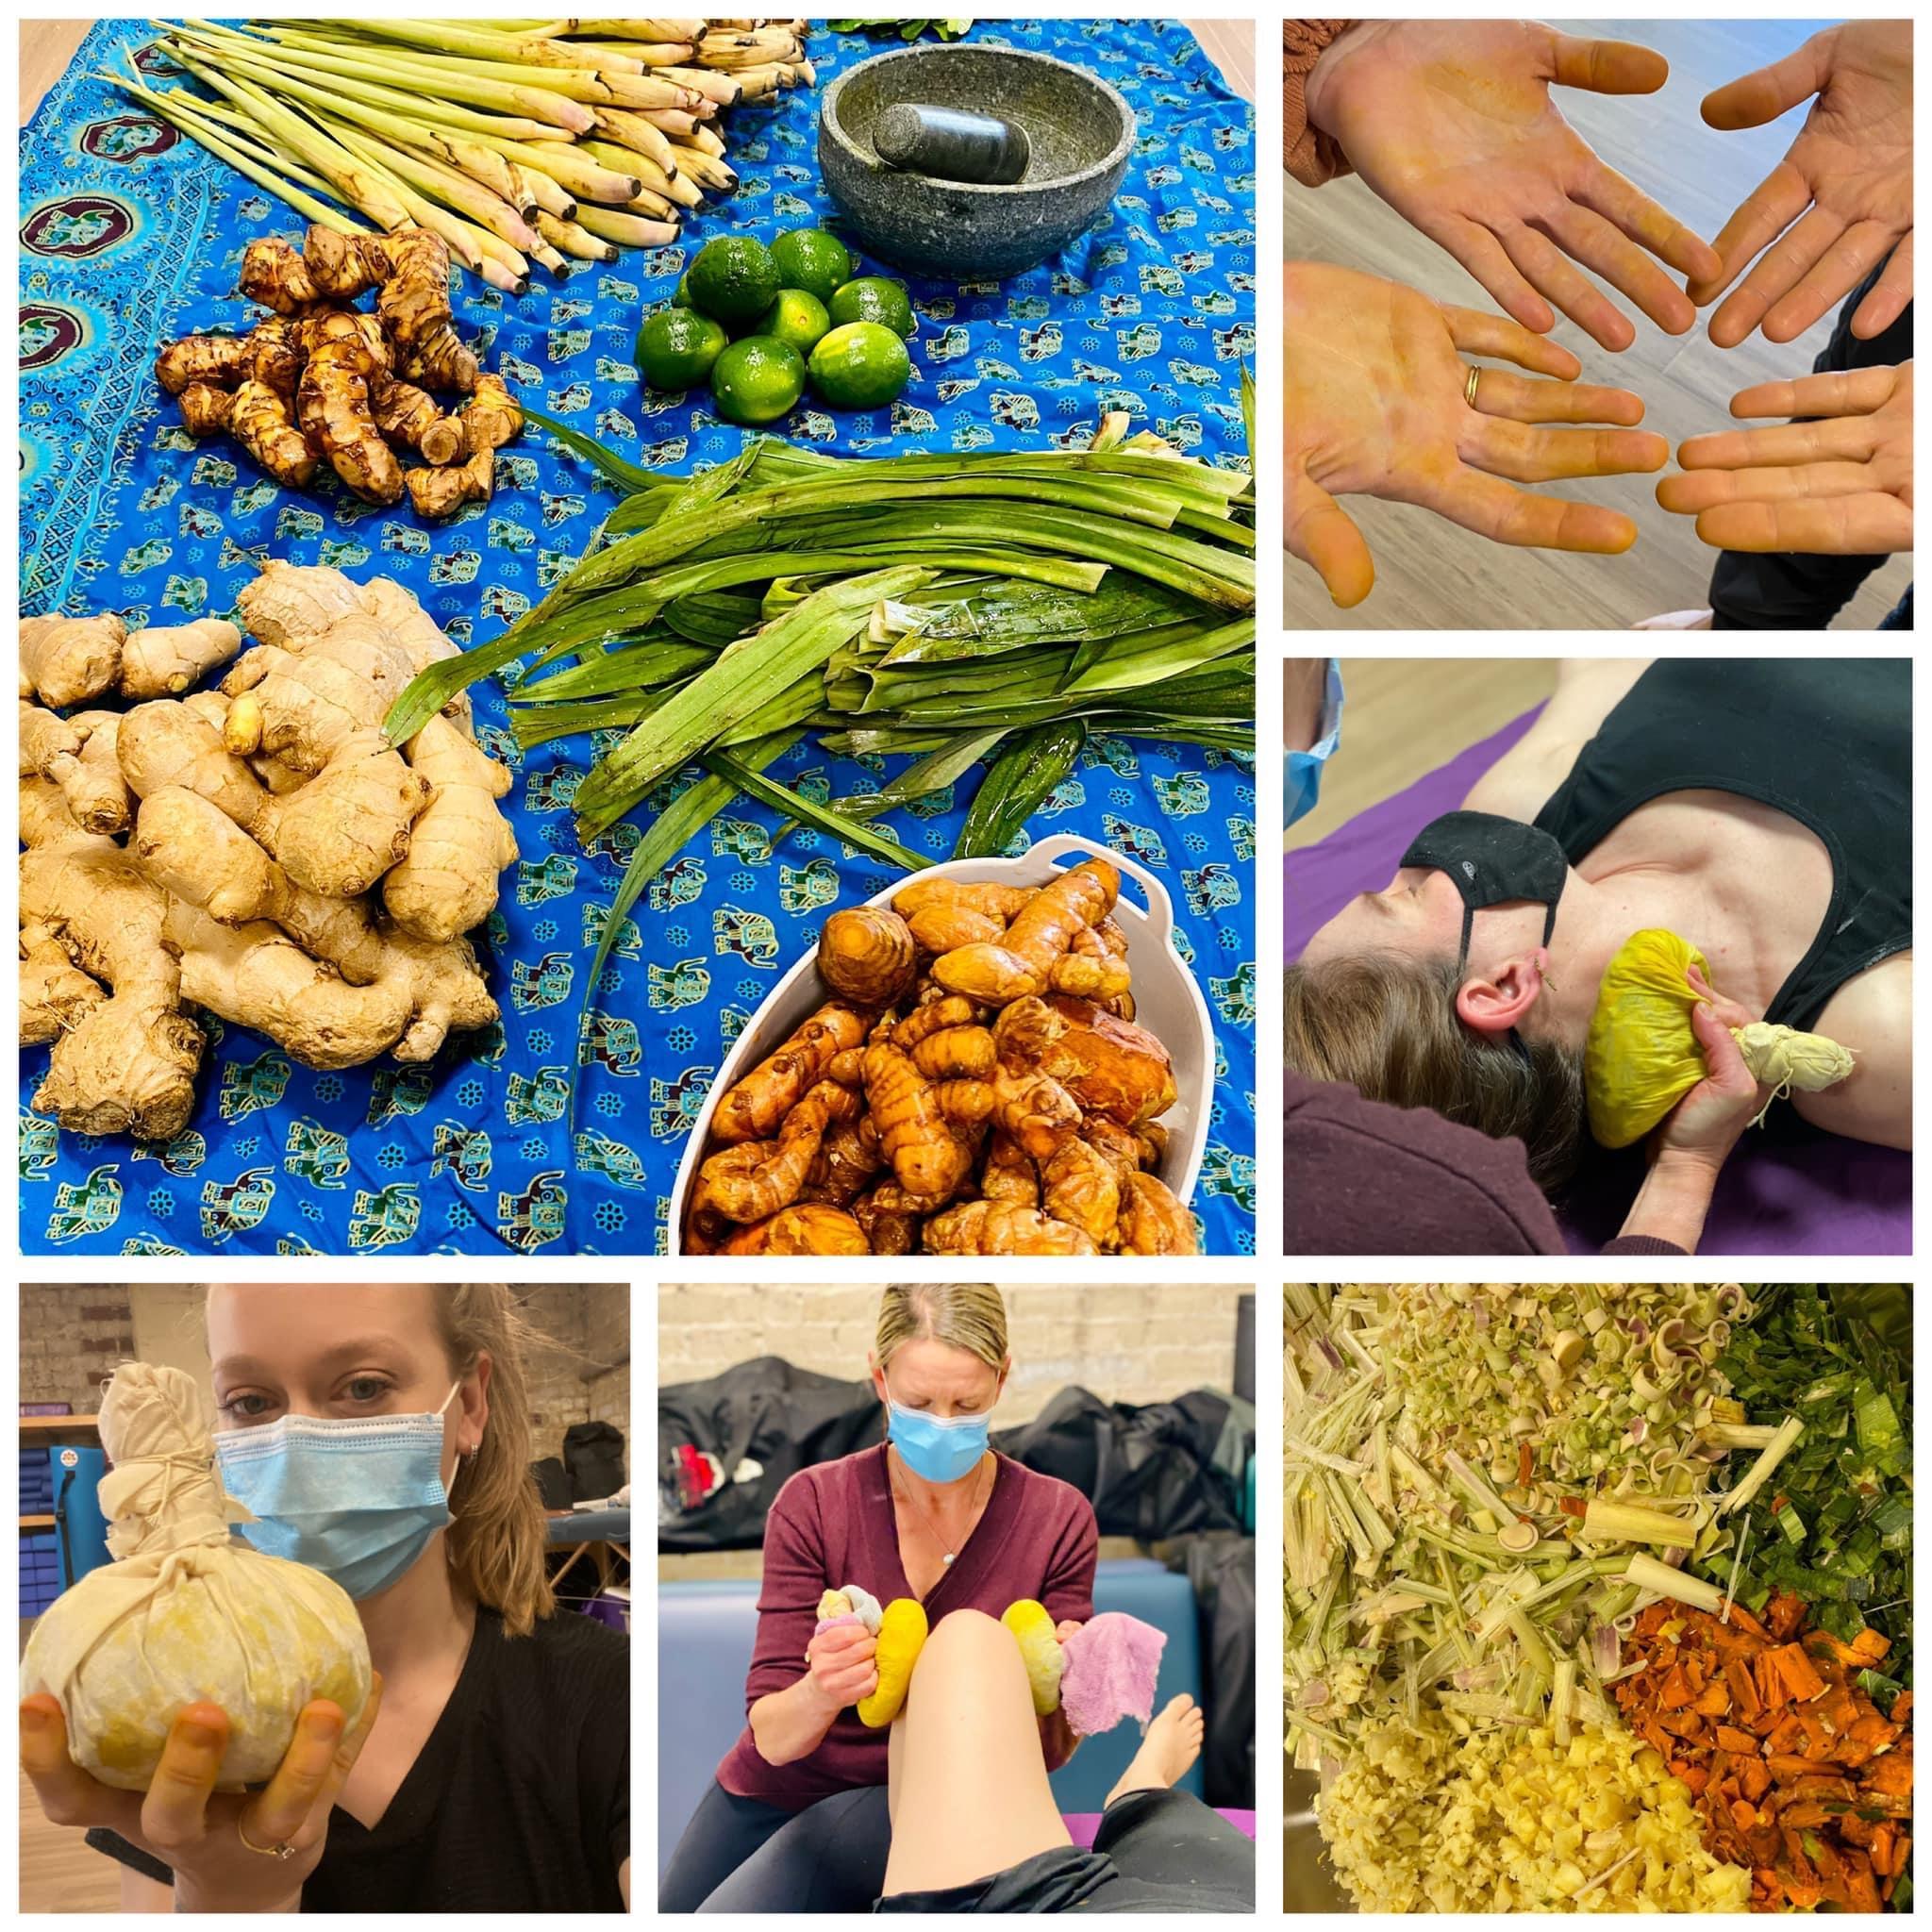 Thai Herbal Compress Massage 7 CEs